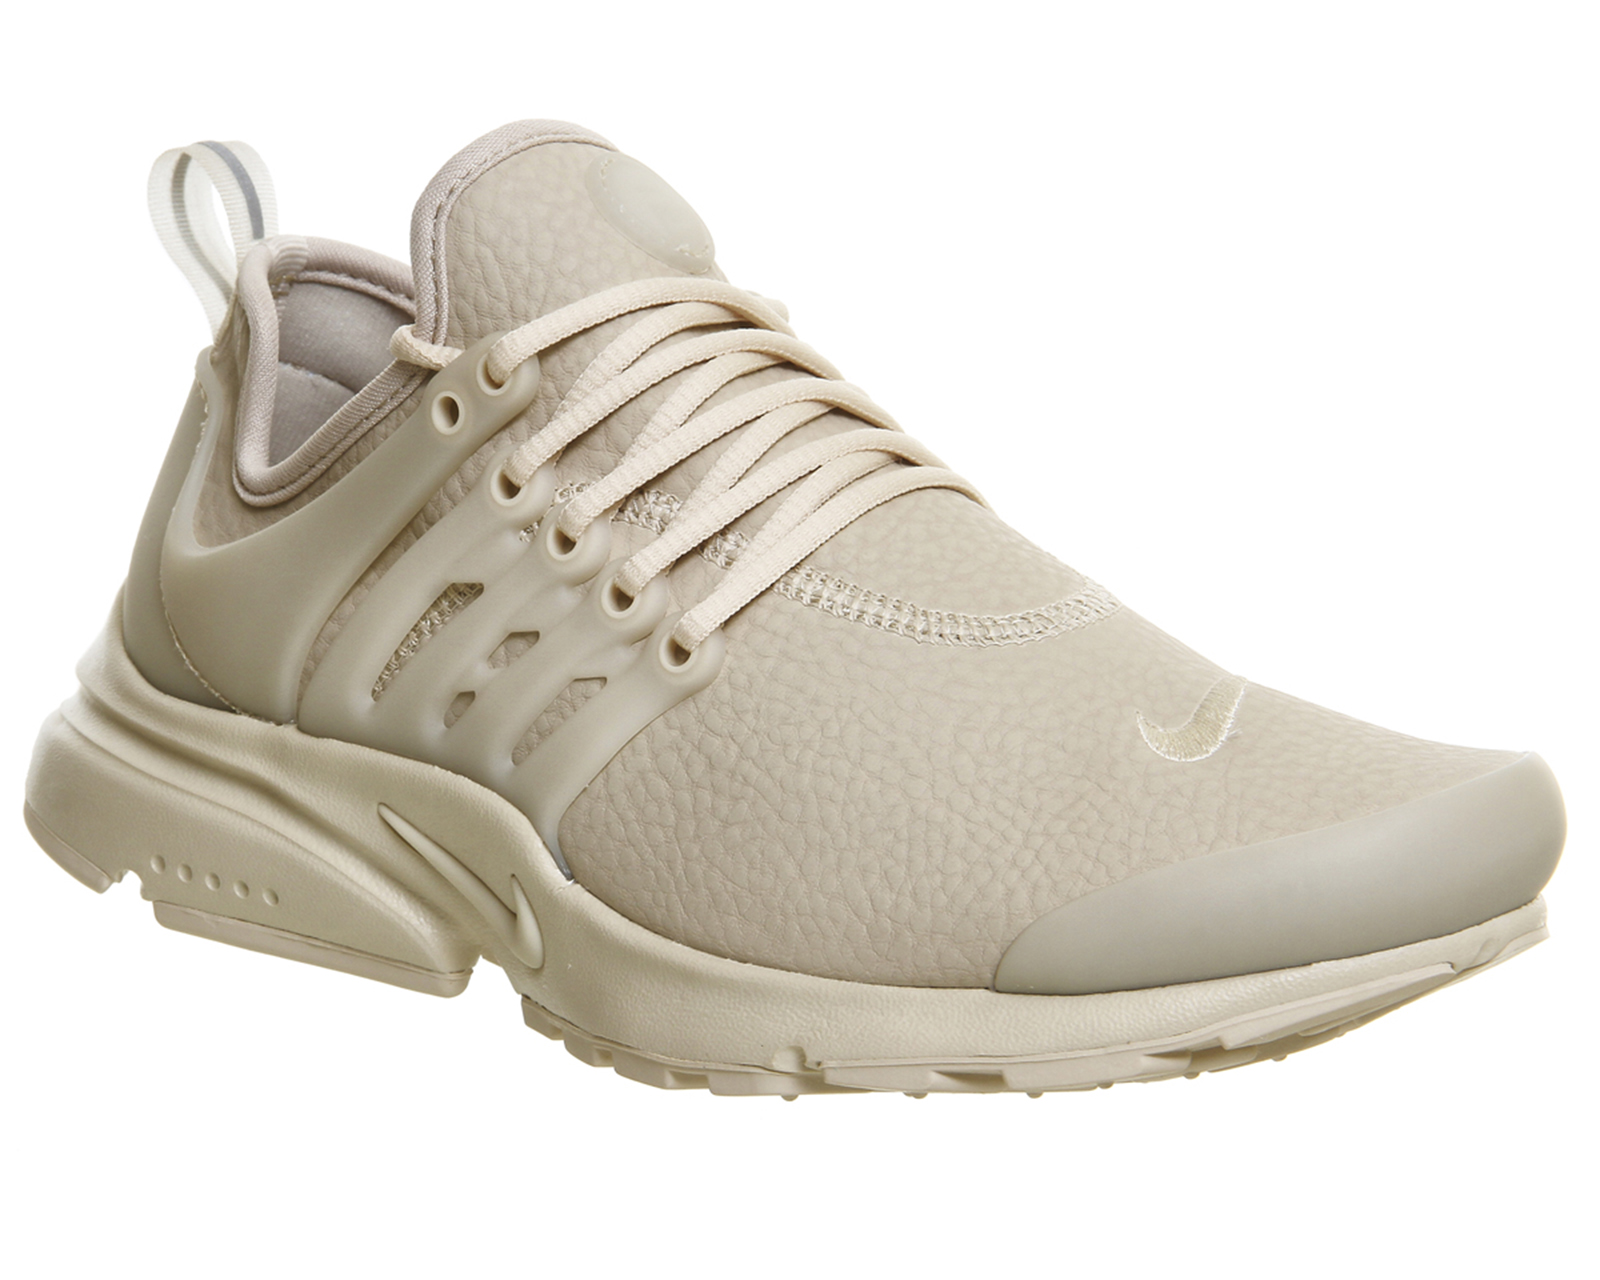 new concept 8eda0 20247 Nike Air Presto Oatmeal Mono Prm - junior